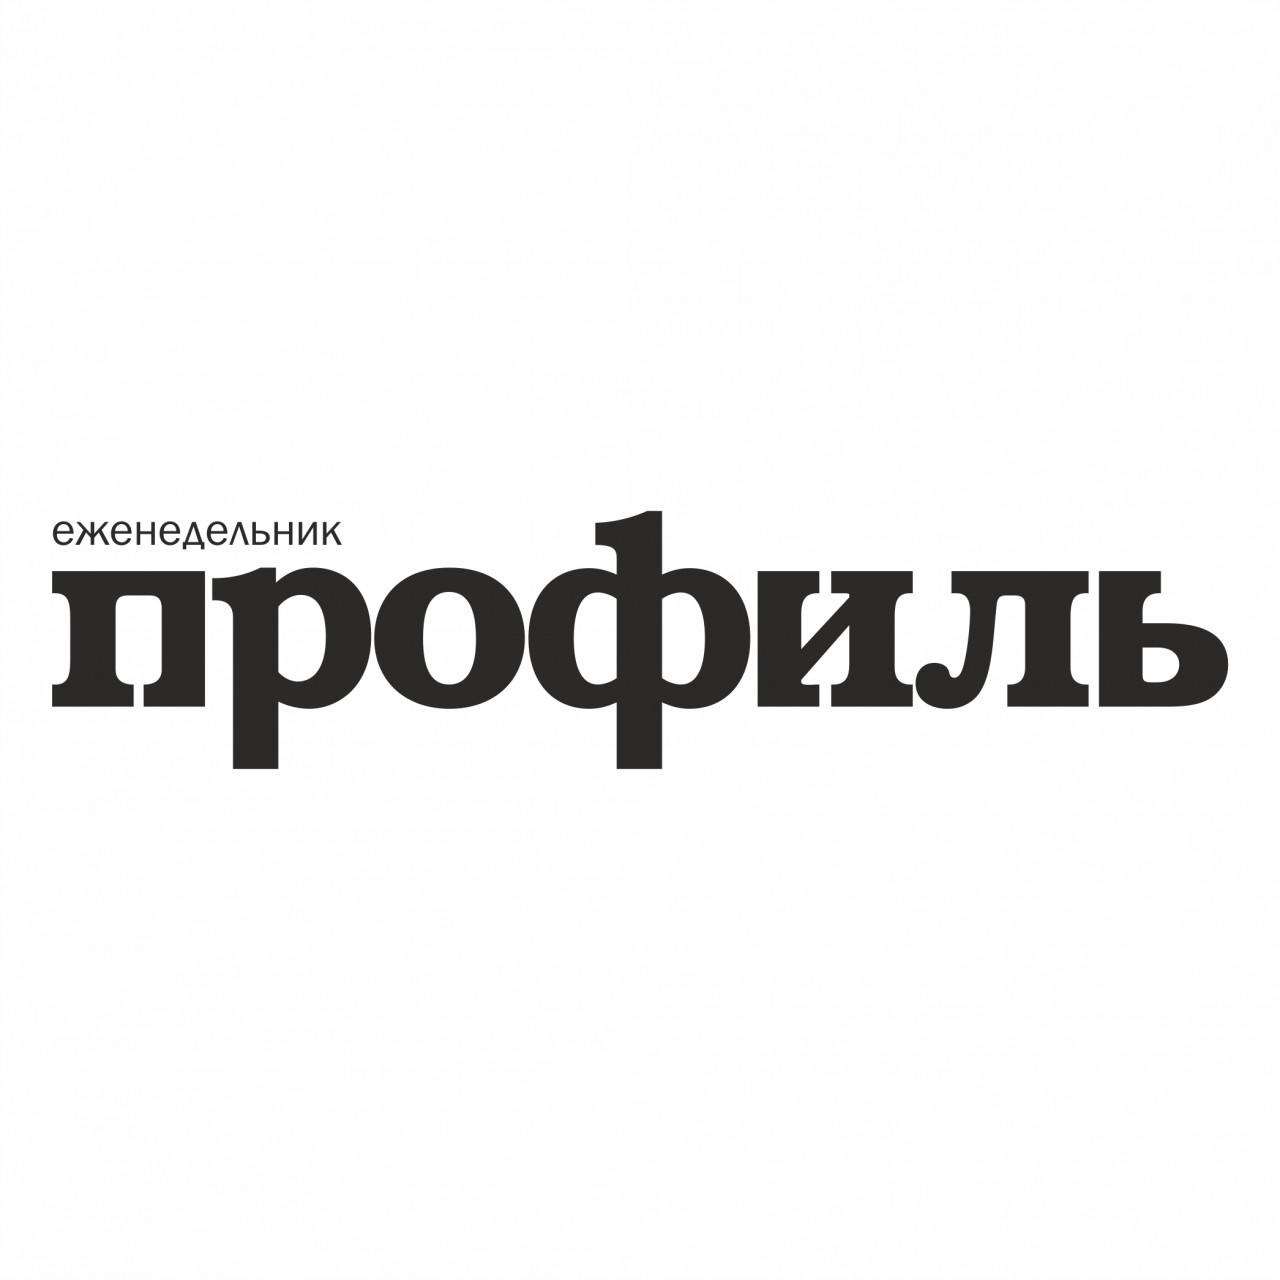 Захарова: Запад обманул Россию